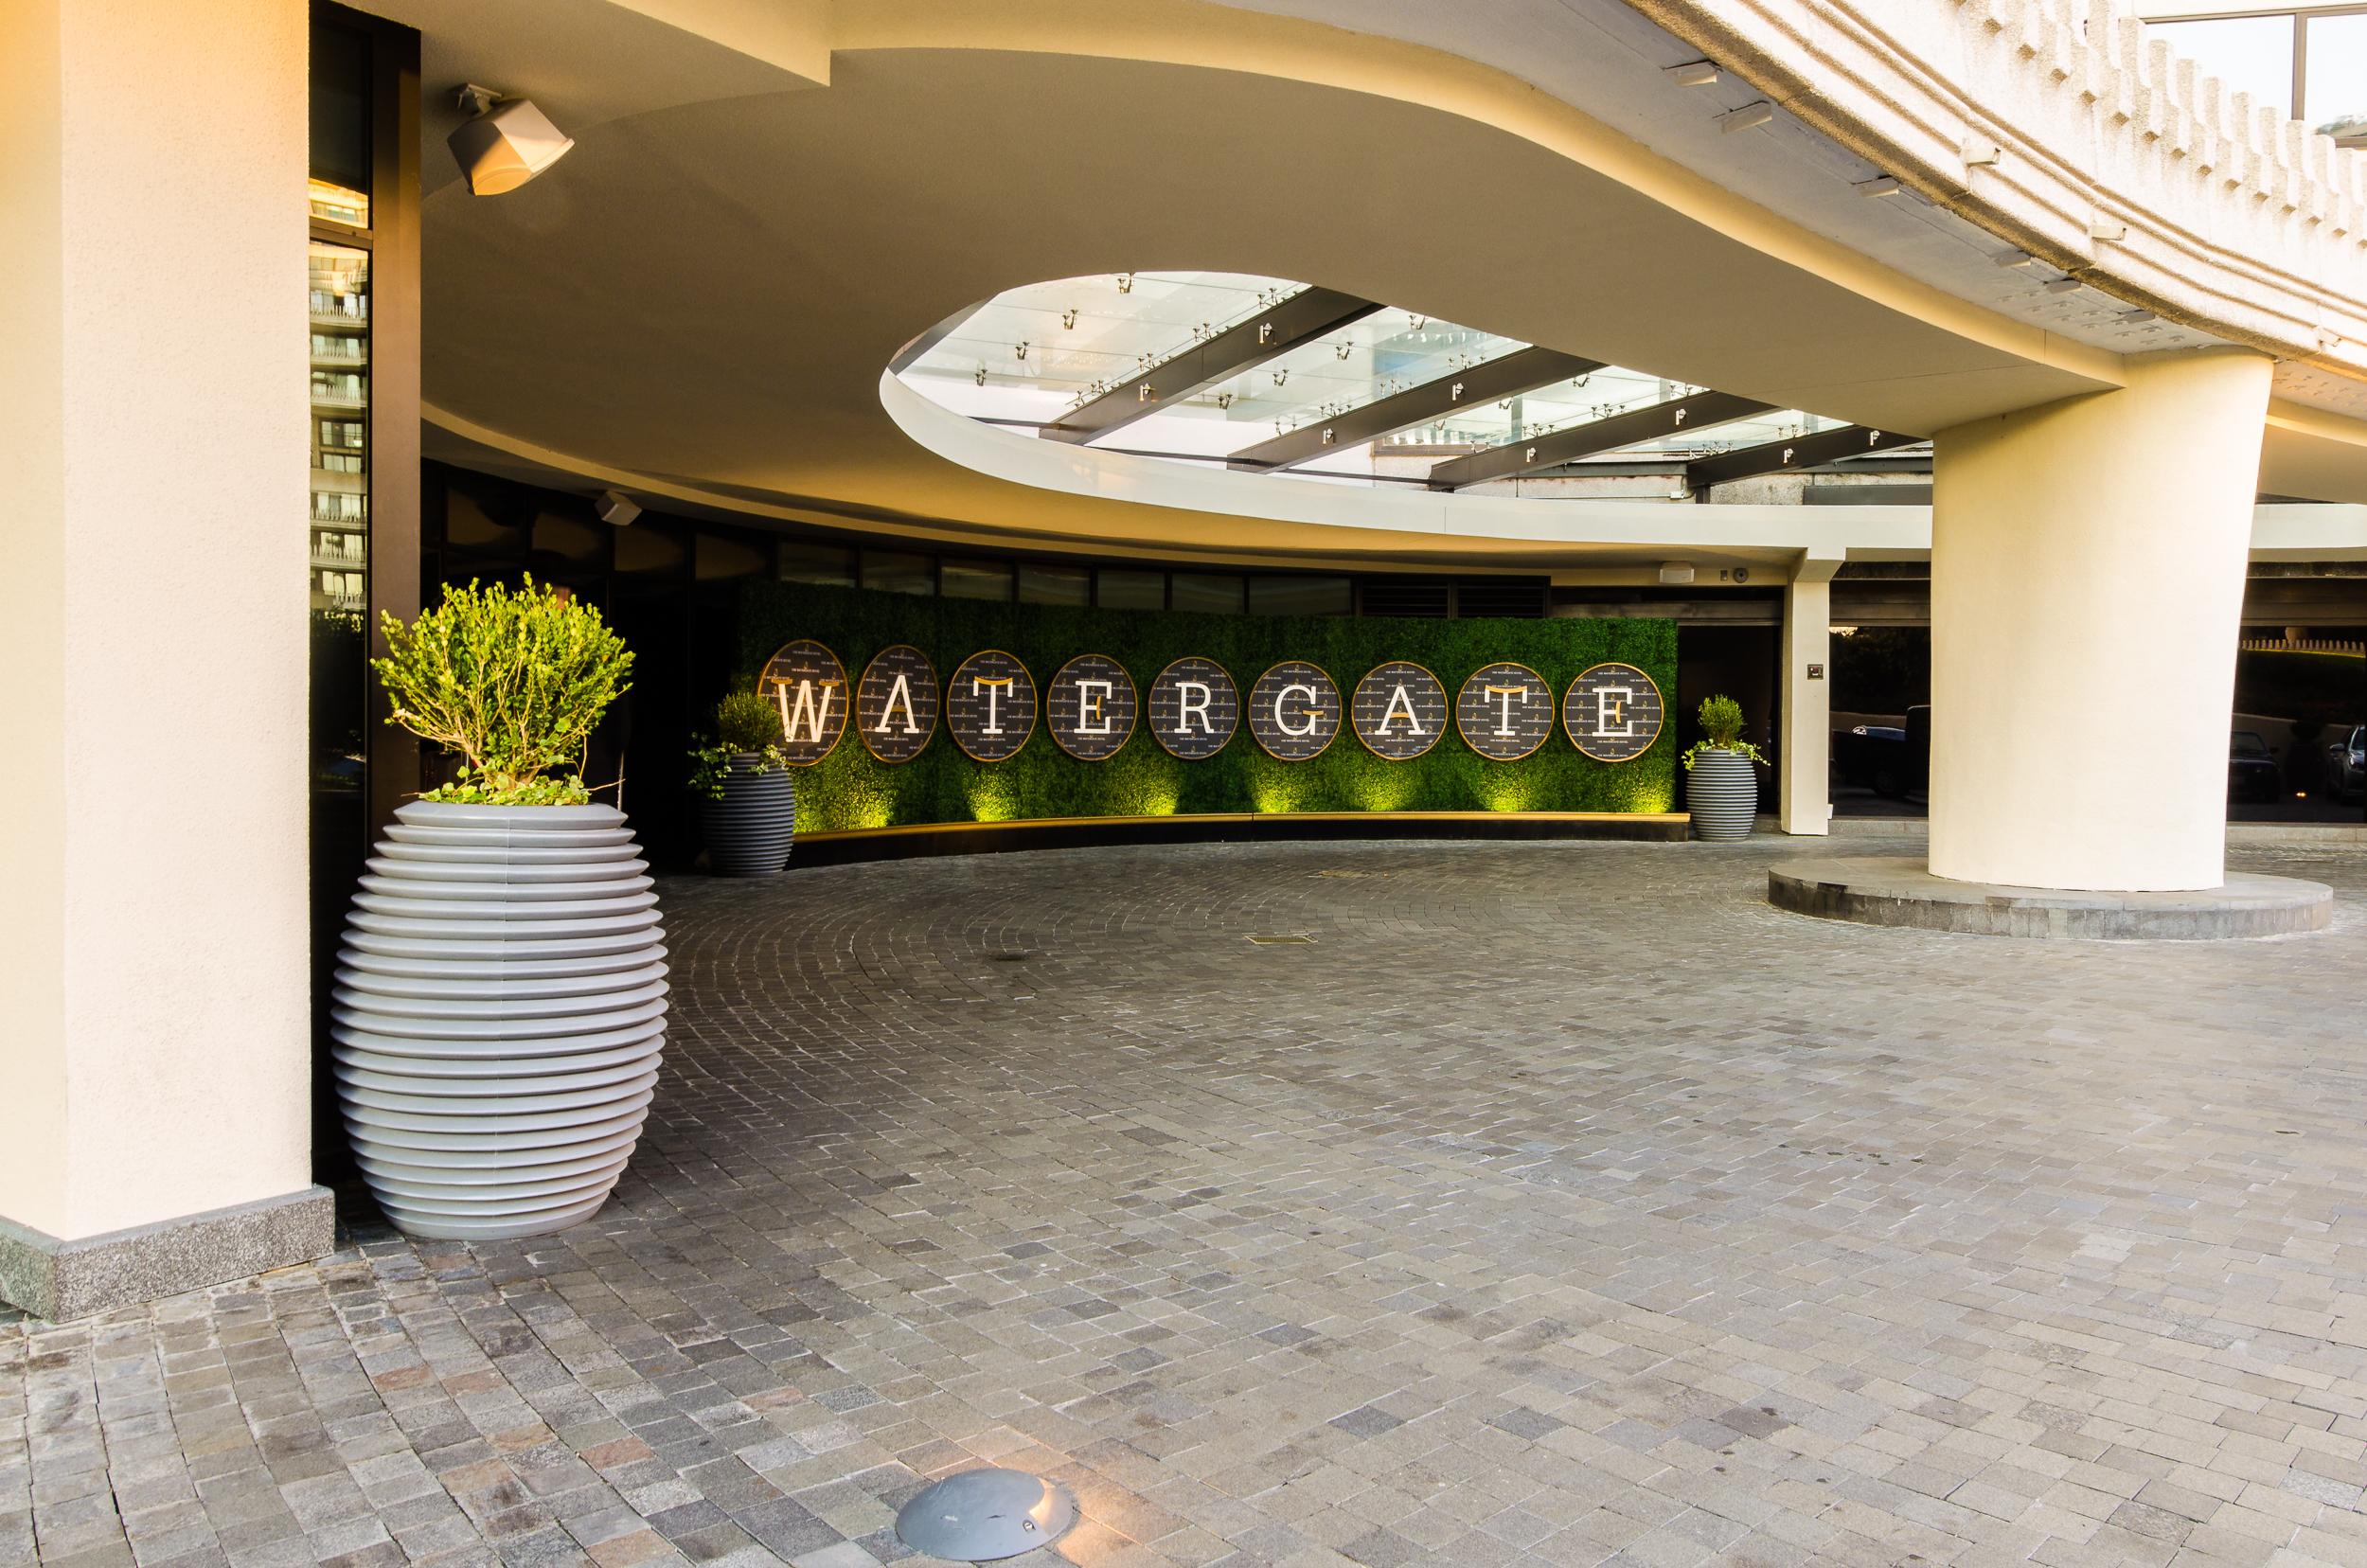 13_Watergate Hotel 01.jpg